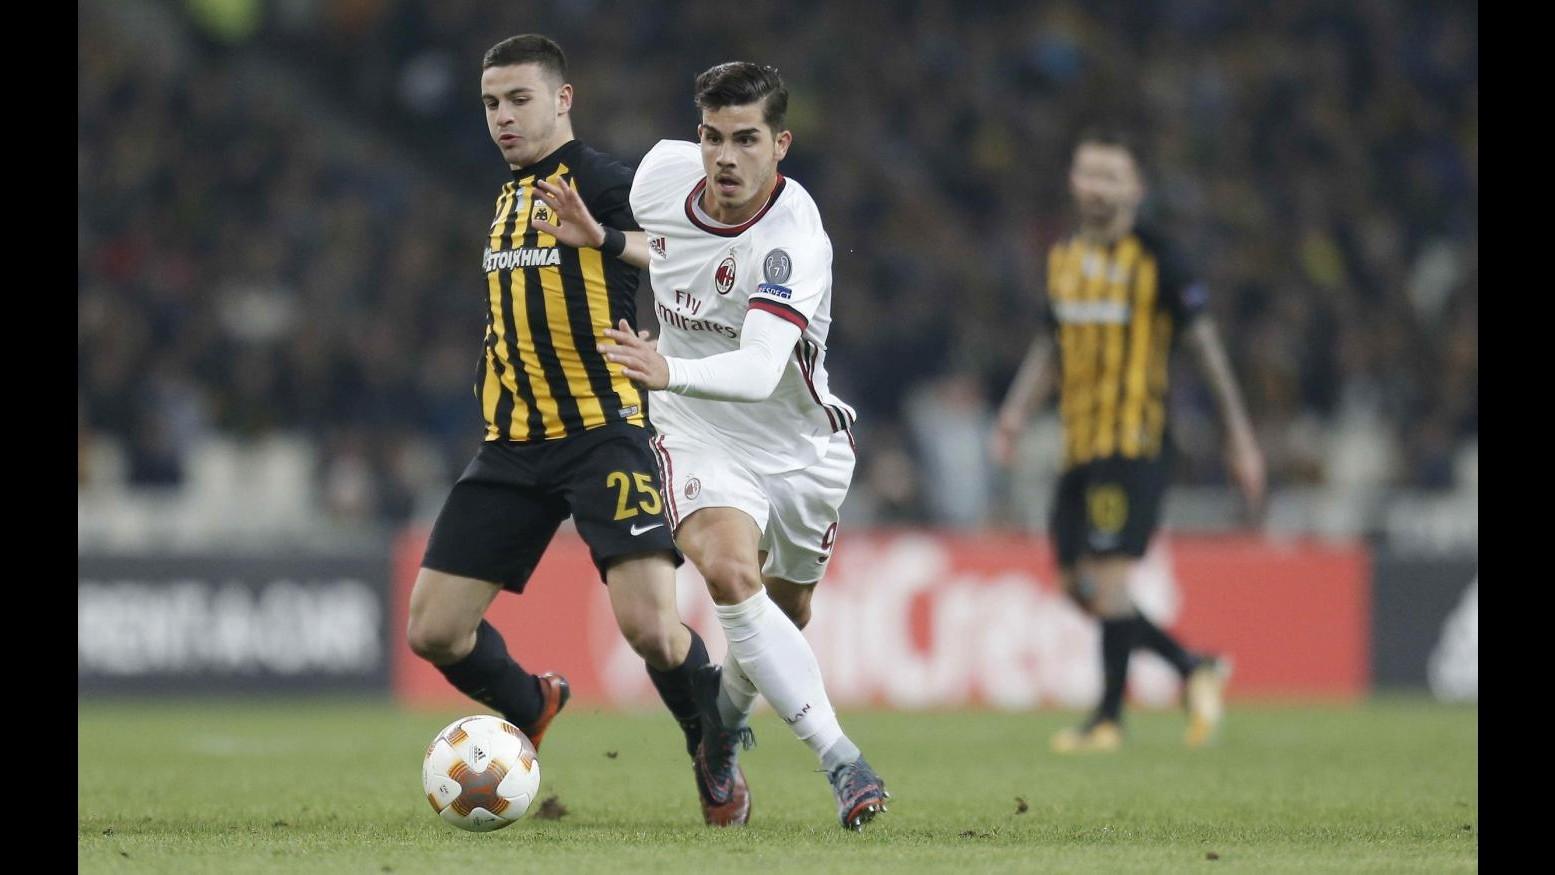 Europa League, Milan sbatte contro muro Aek: 0-0 ad Atene, rossoneri primi